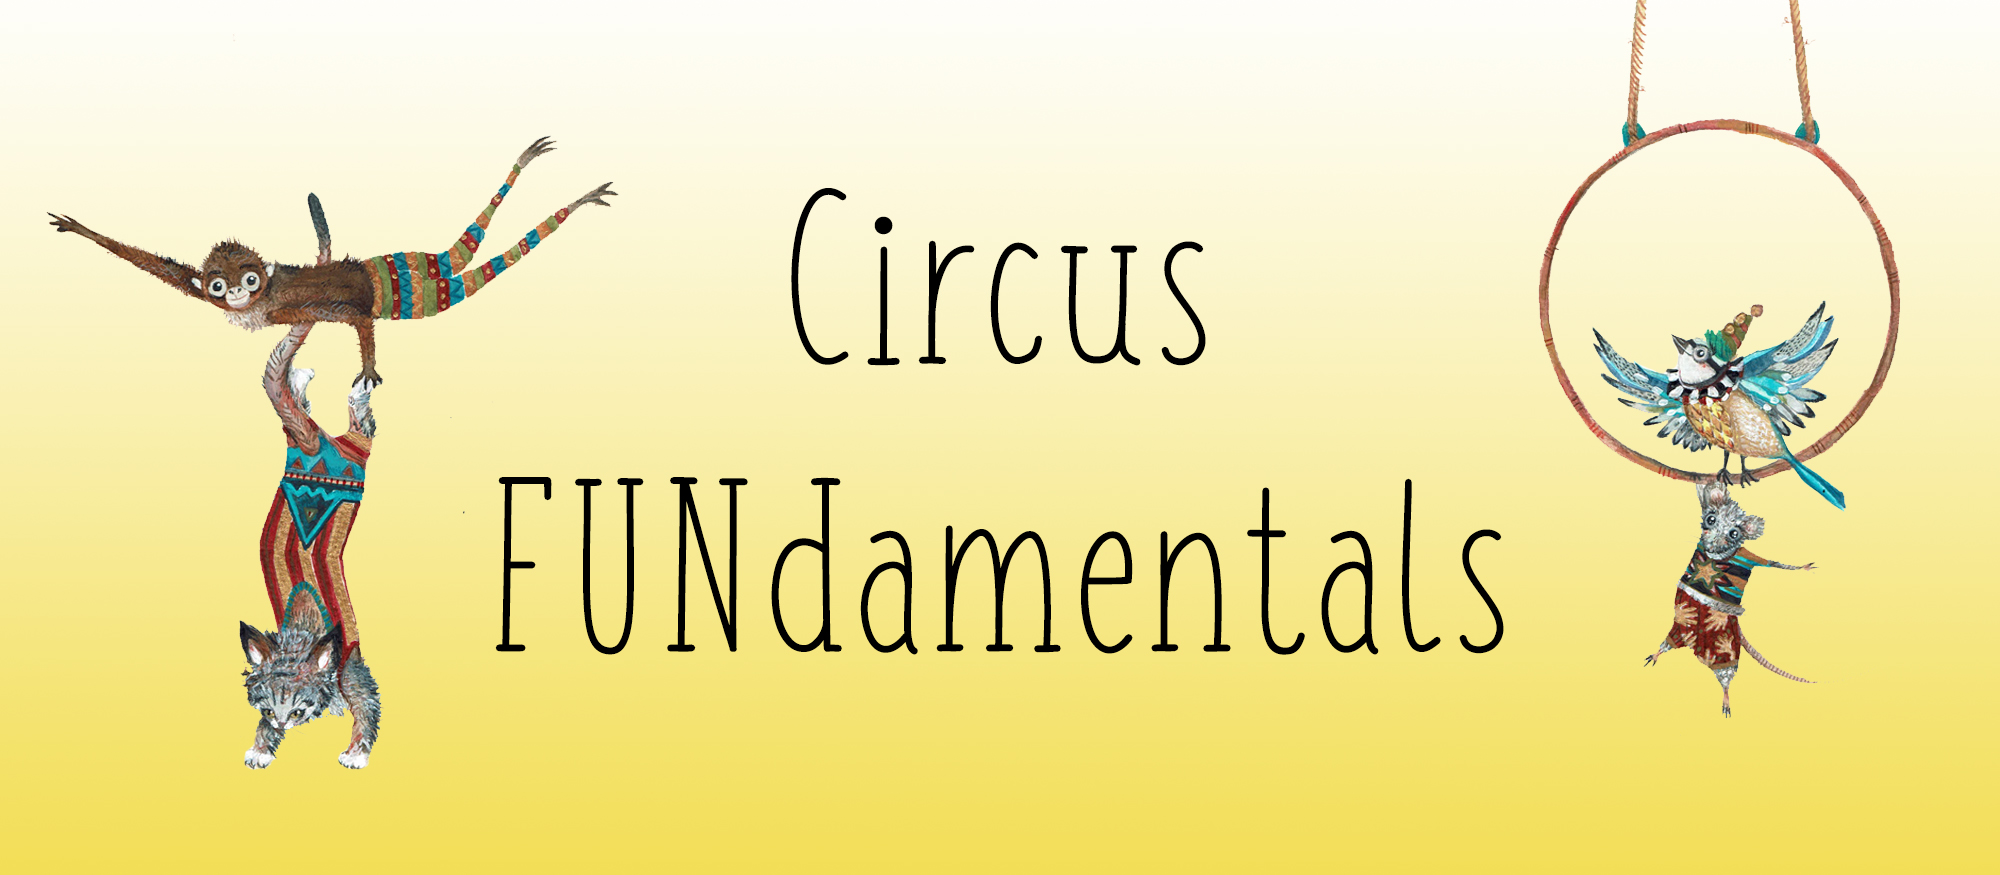 CircusFundamentals Banner.jpg